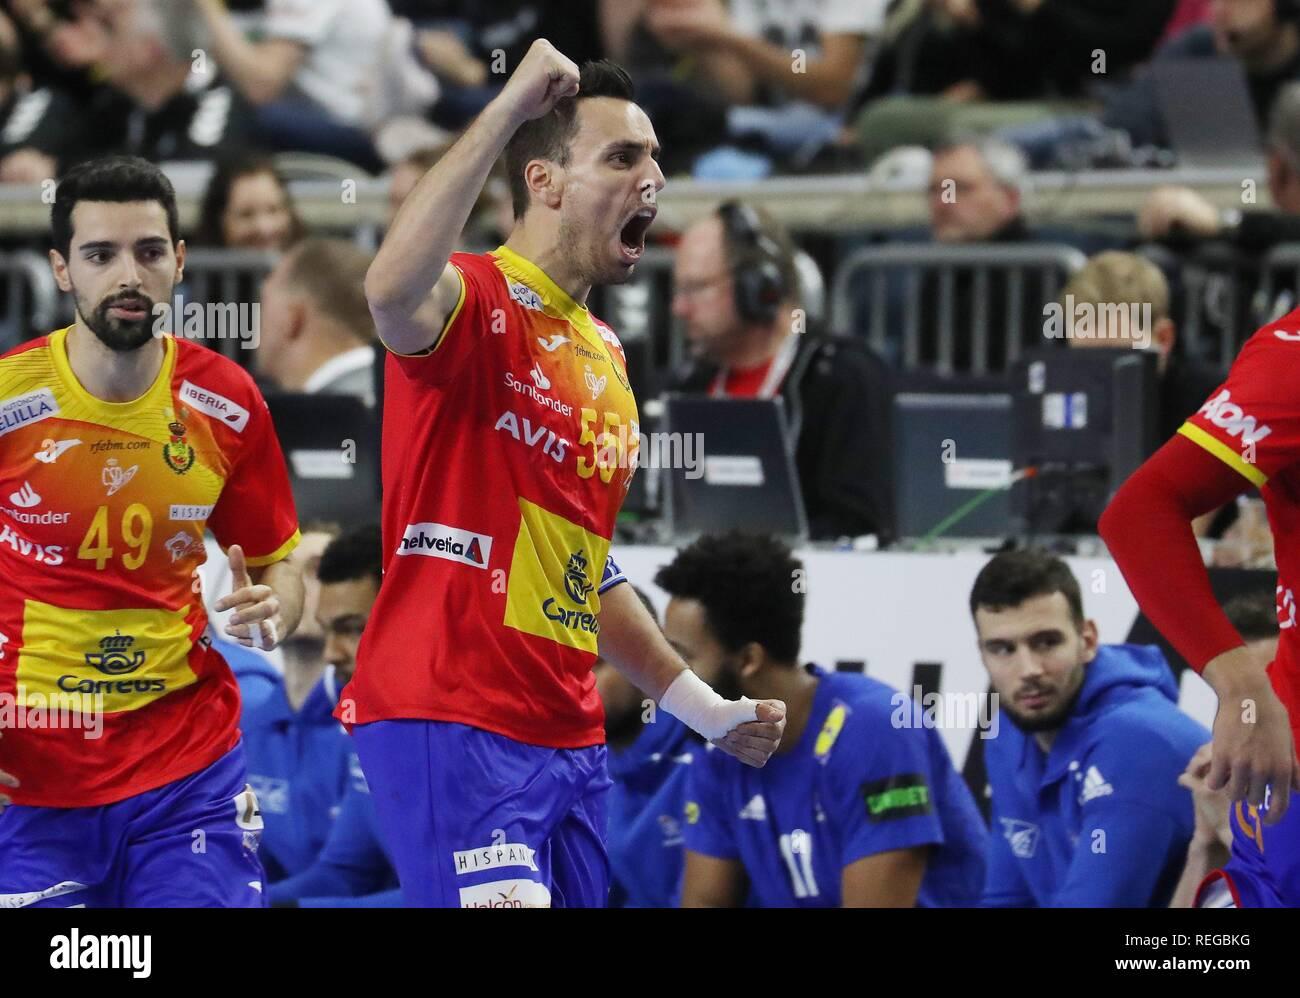 firo: 19.01.2019, Handball: World Cup World Cup Main Round France - Spain jubilation, Adrian Figueras Trejo, ESP   usage worldwide - Stock Image